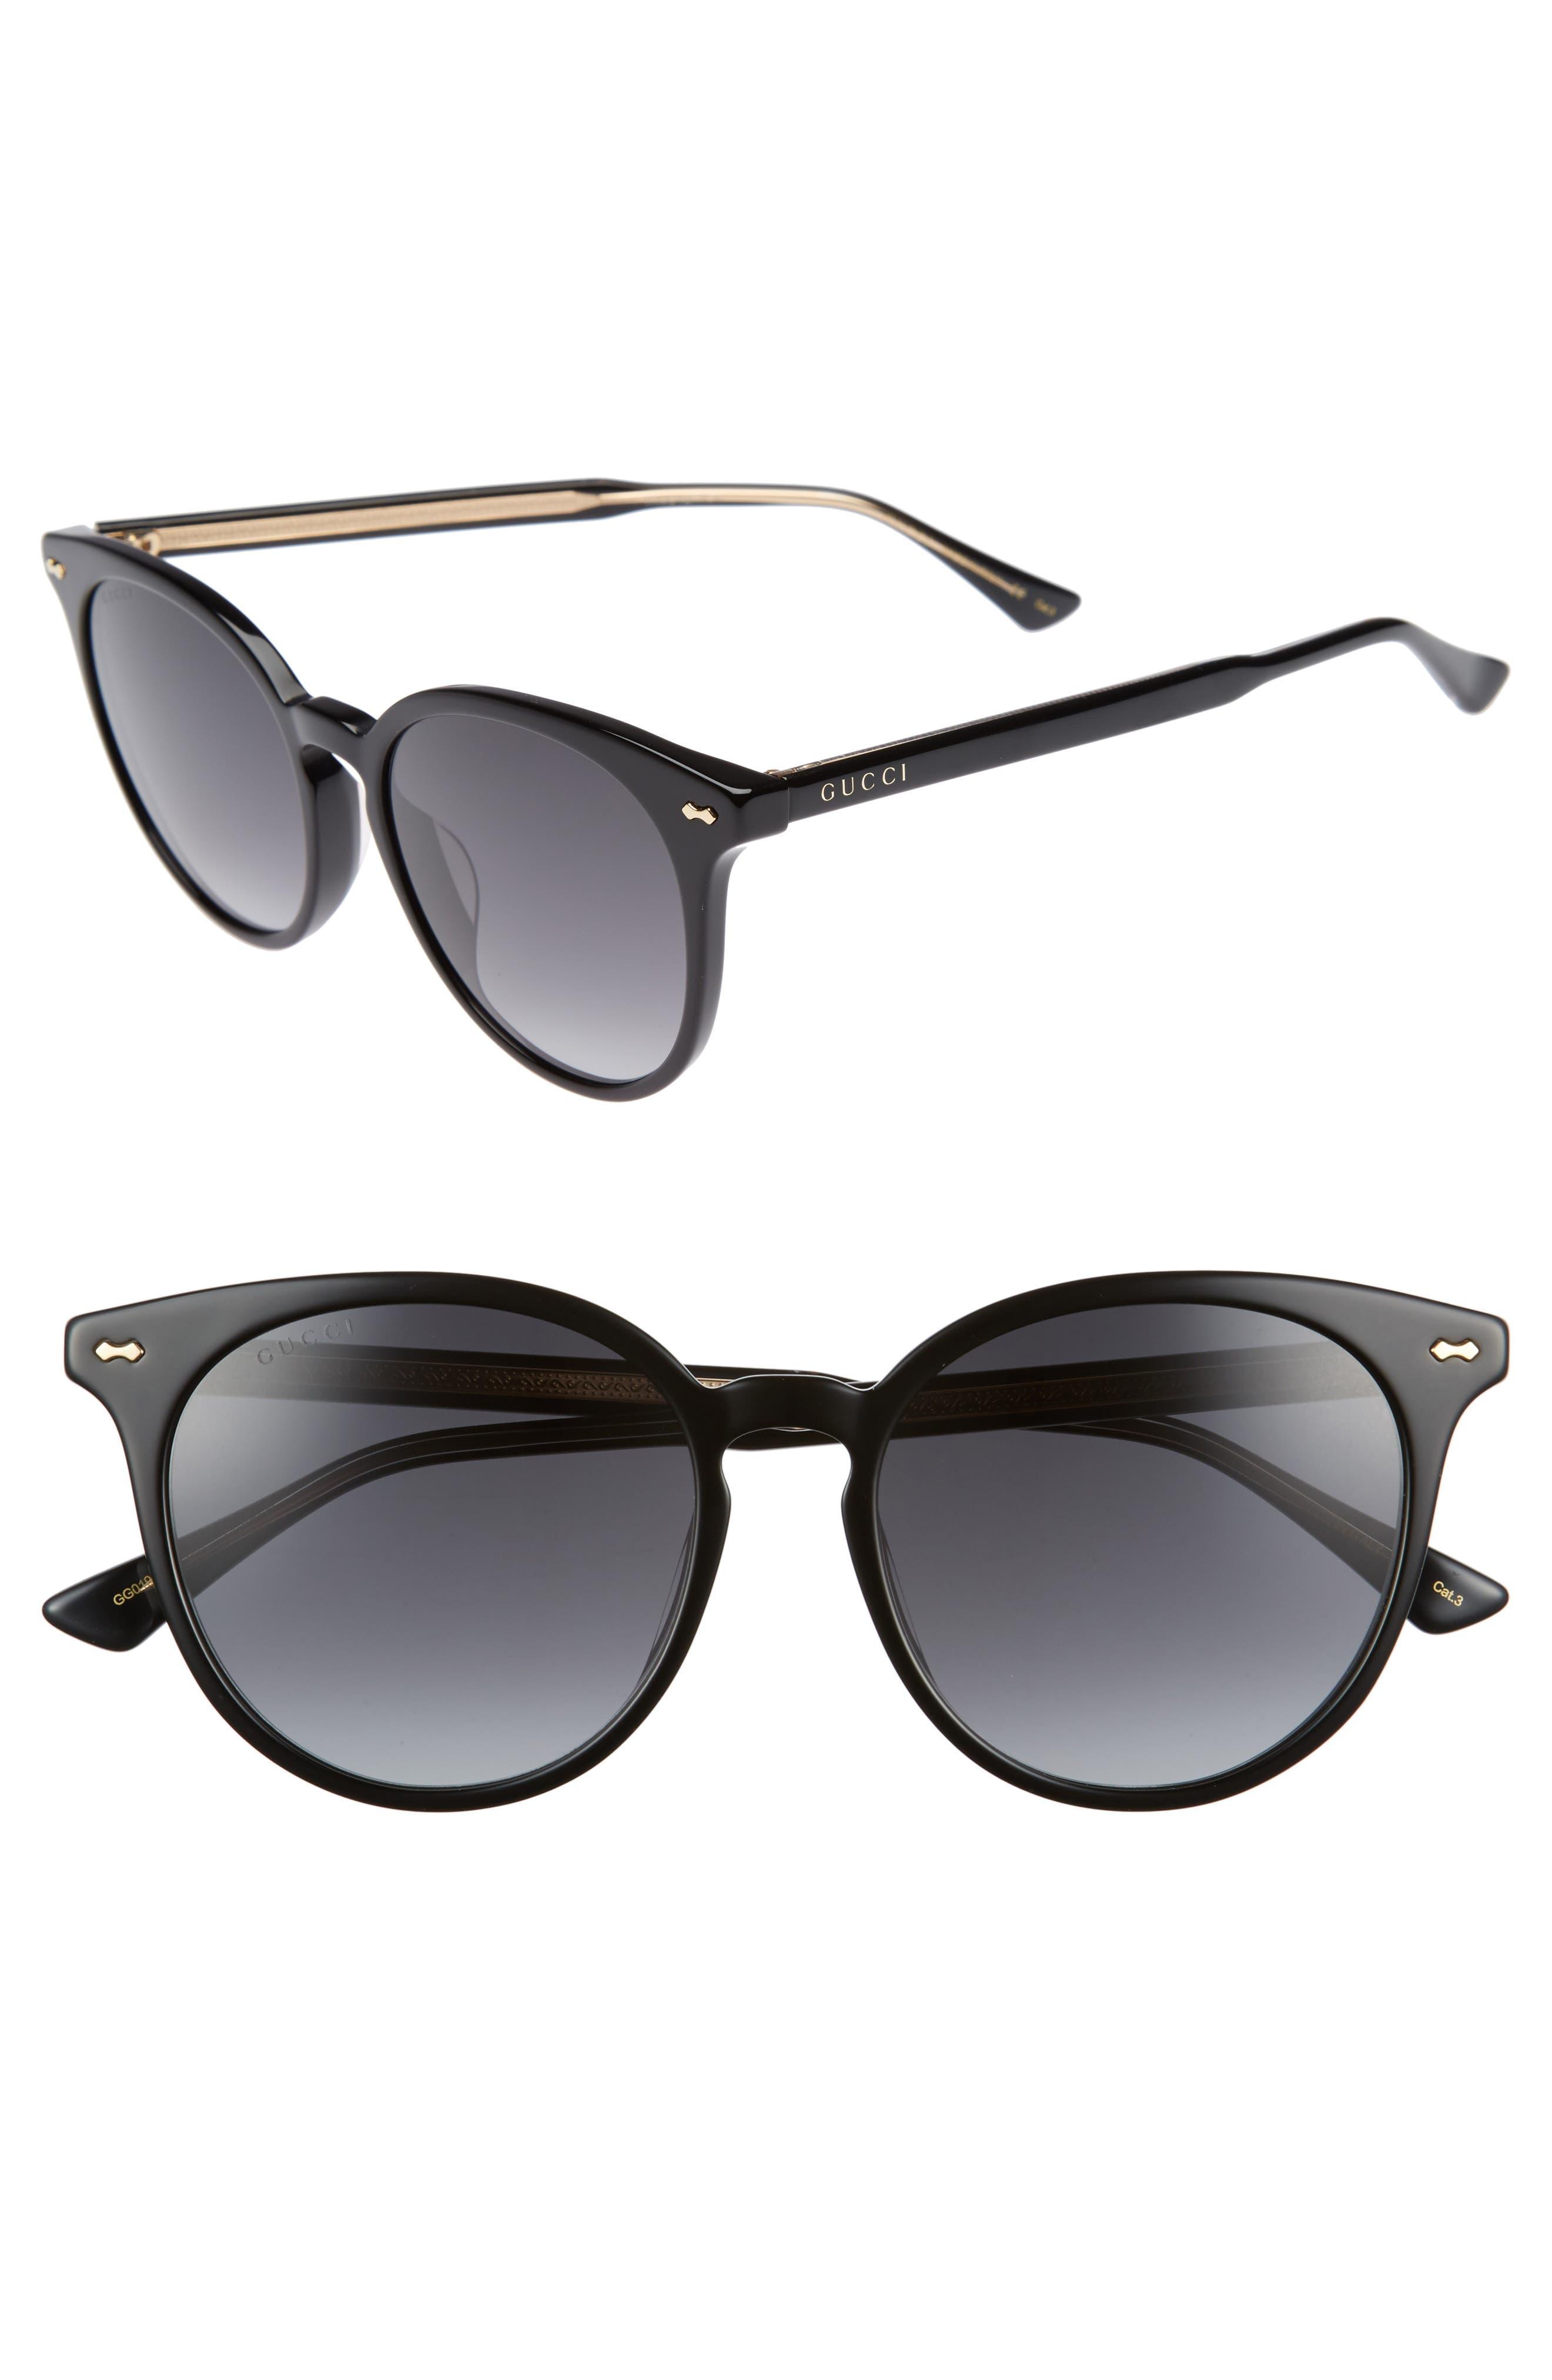 55mm Round Cat Eye Sunglasses,                             Main thumbnail 1, color,                             Black